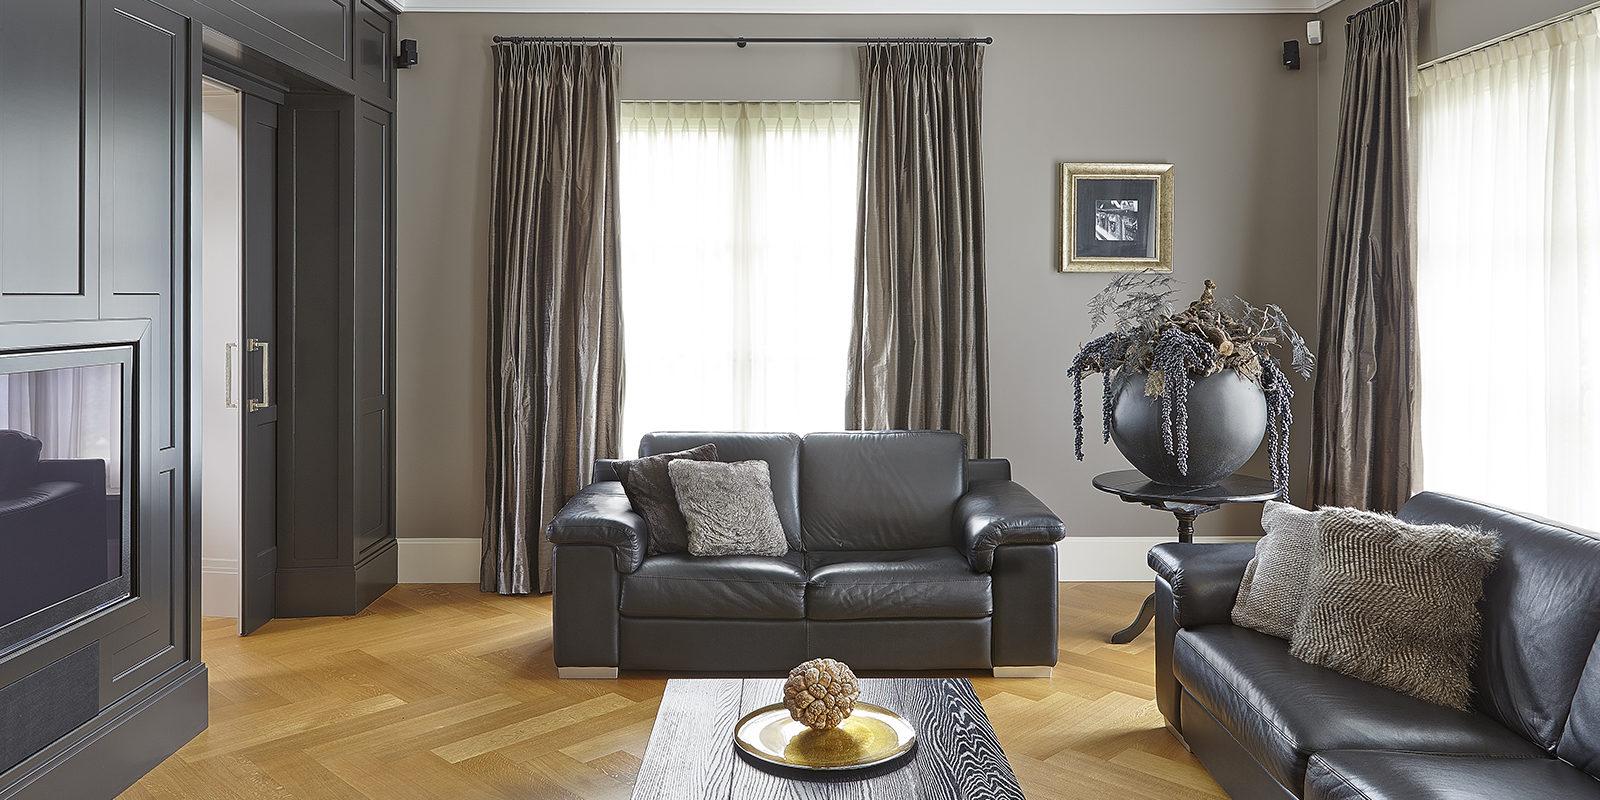 The Art of Living, Exclusief wonen, Marco Daverveld Interieur designer, woonkamer, gordijnen, televisie, bank, meubilair, modern, banken, zwart